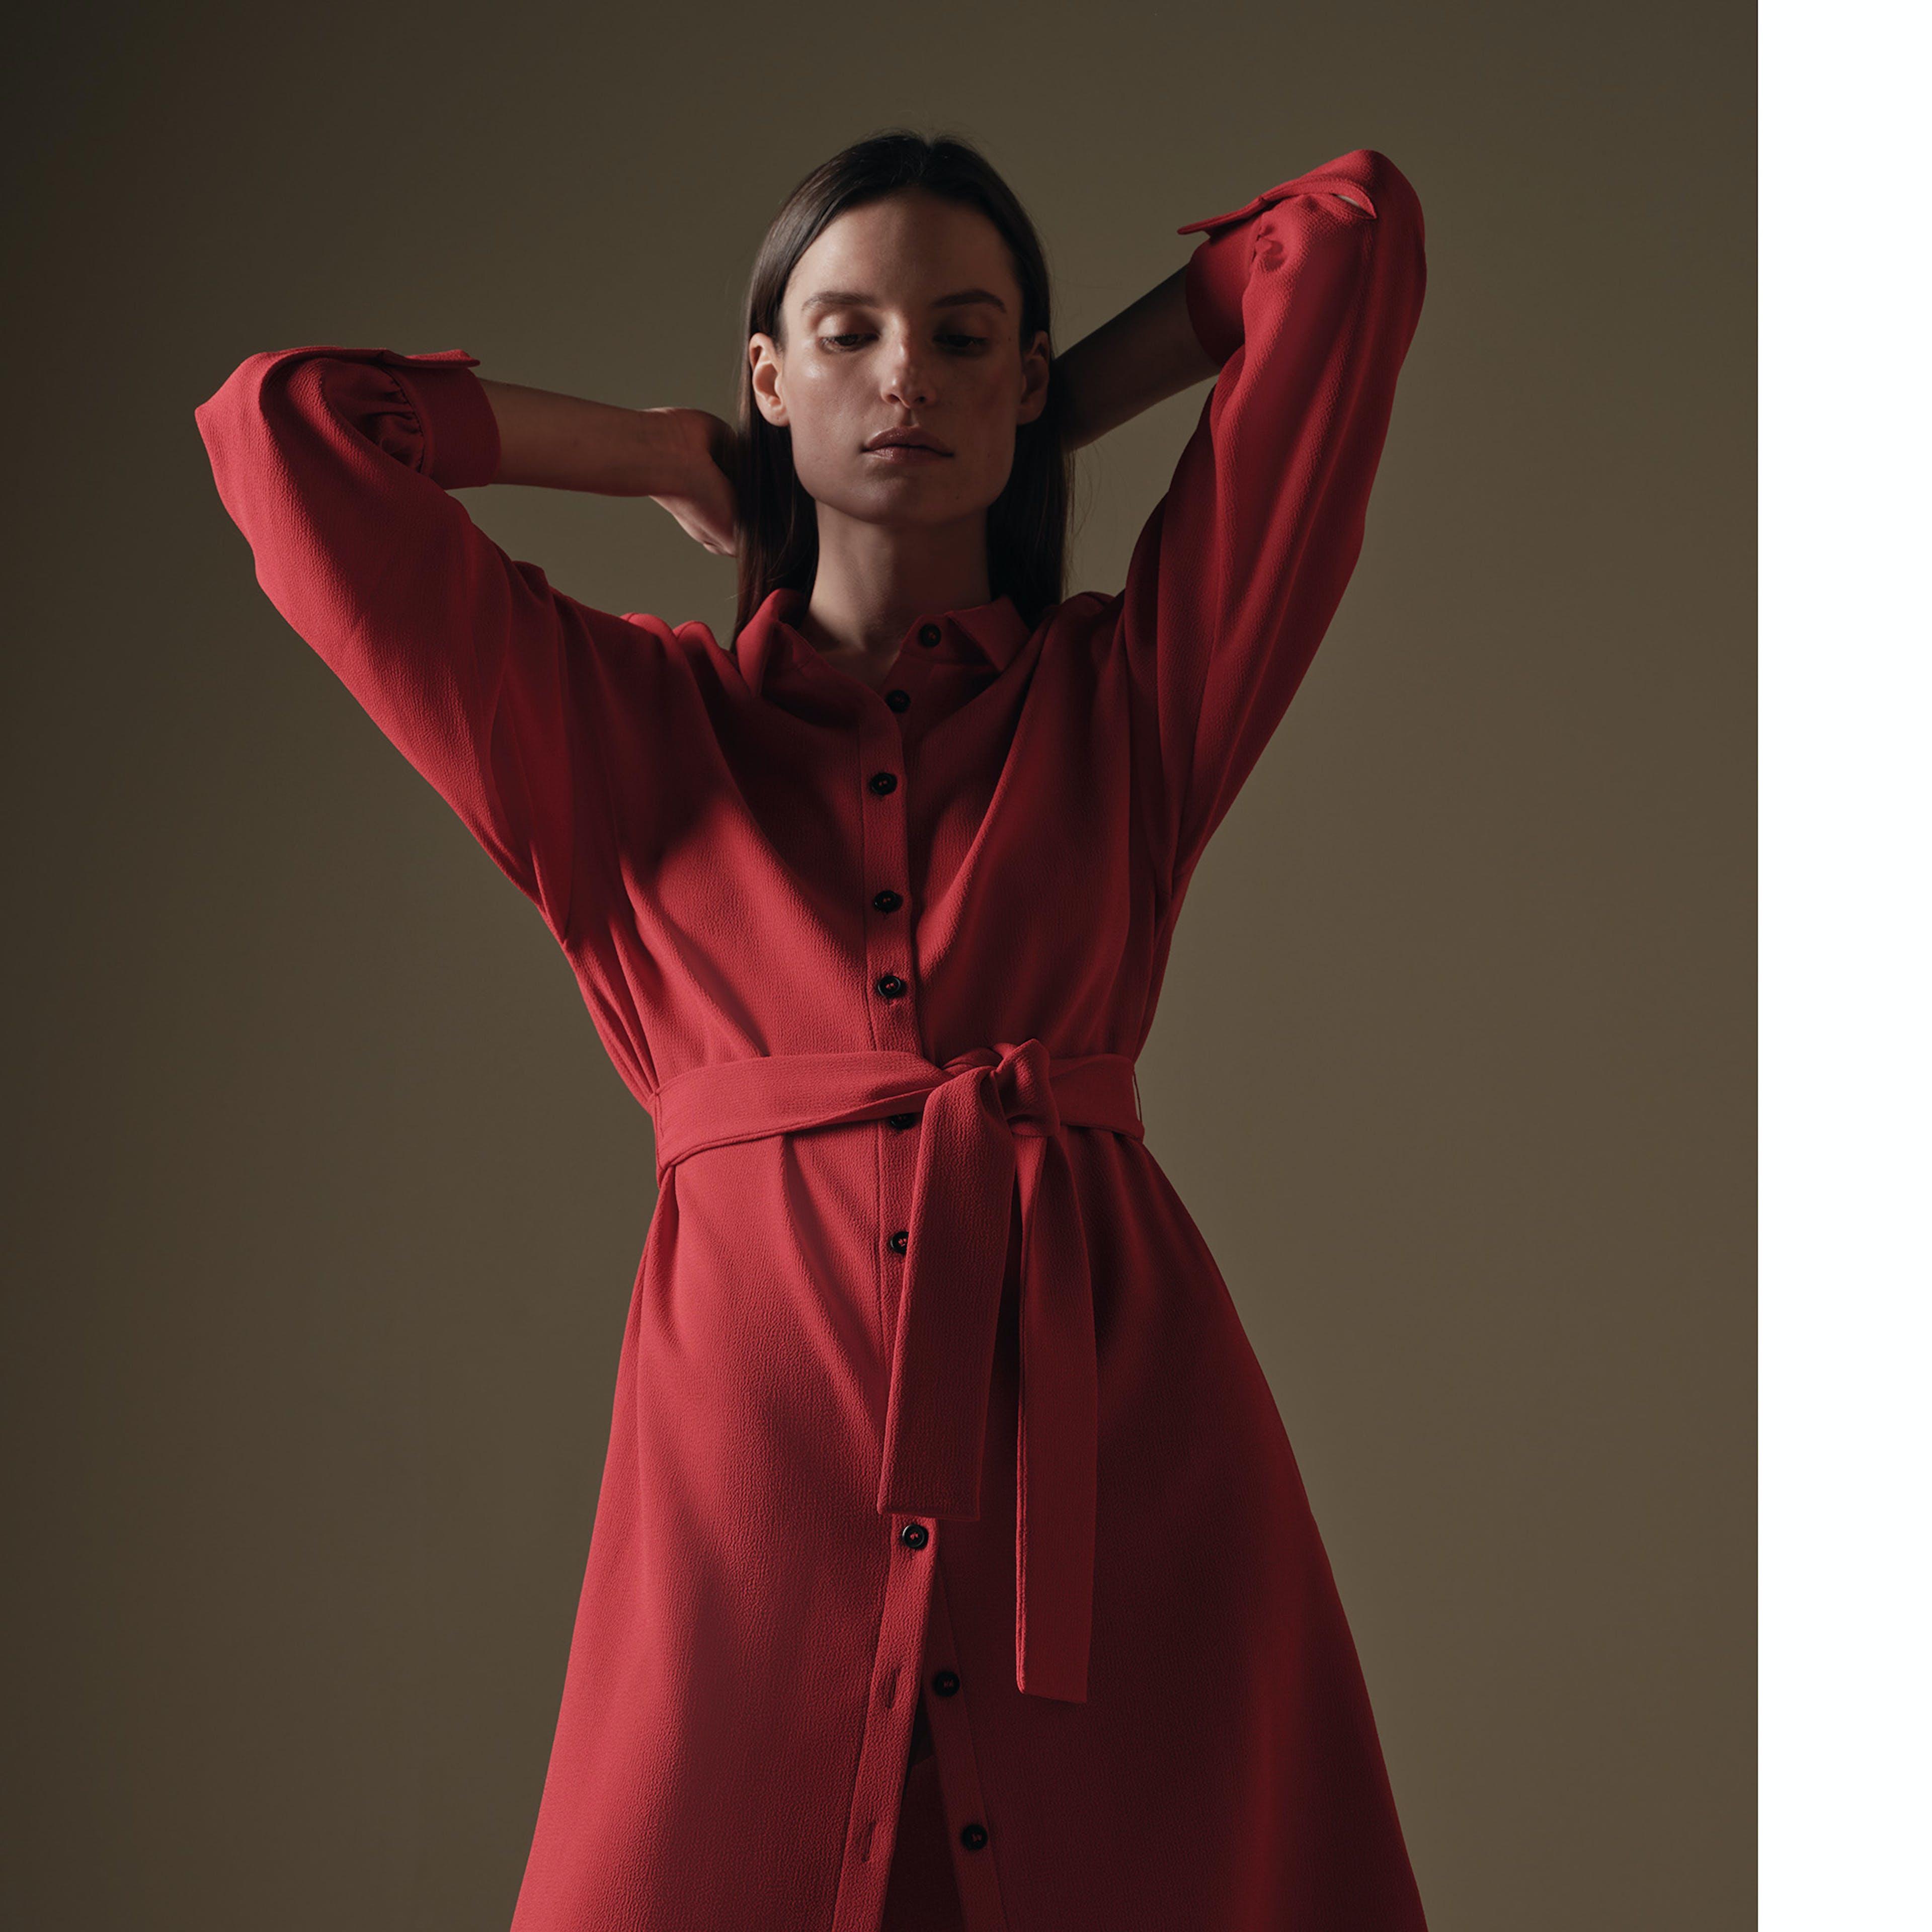 Damen rotes Kleid frontal